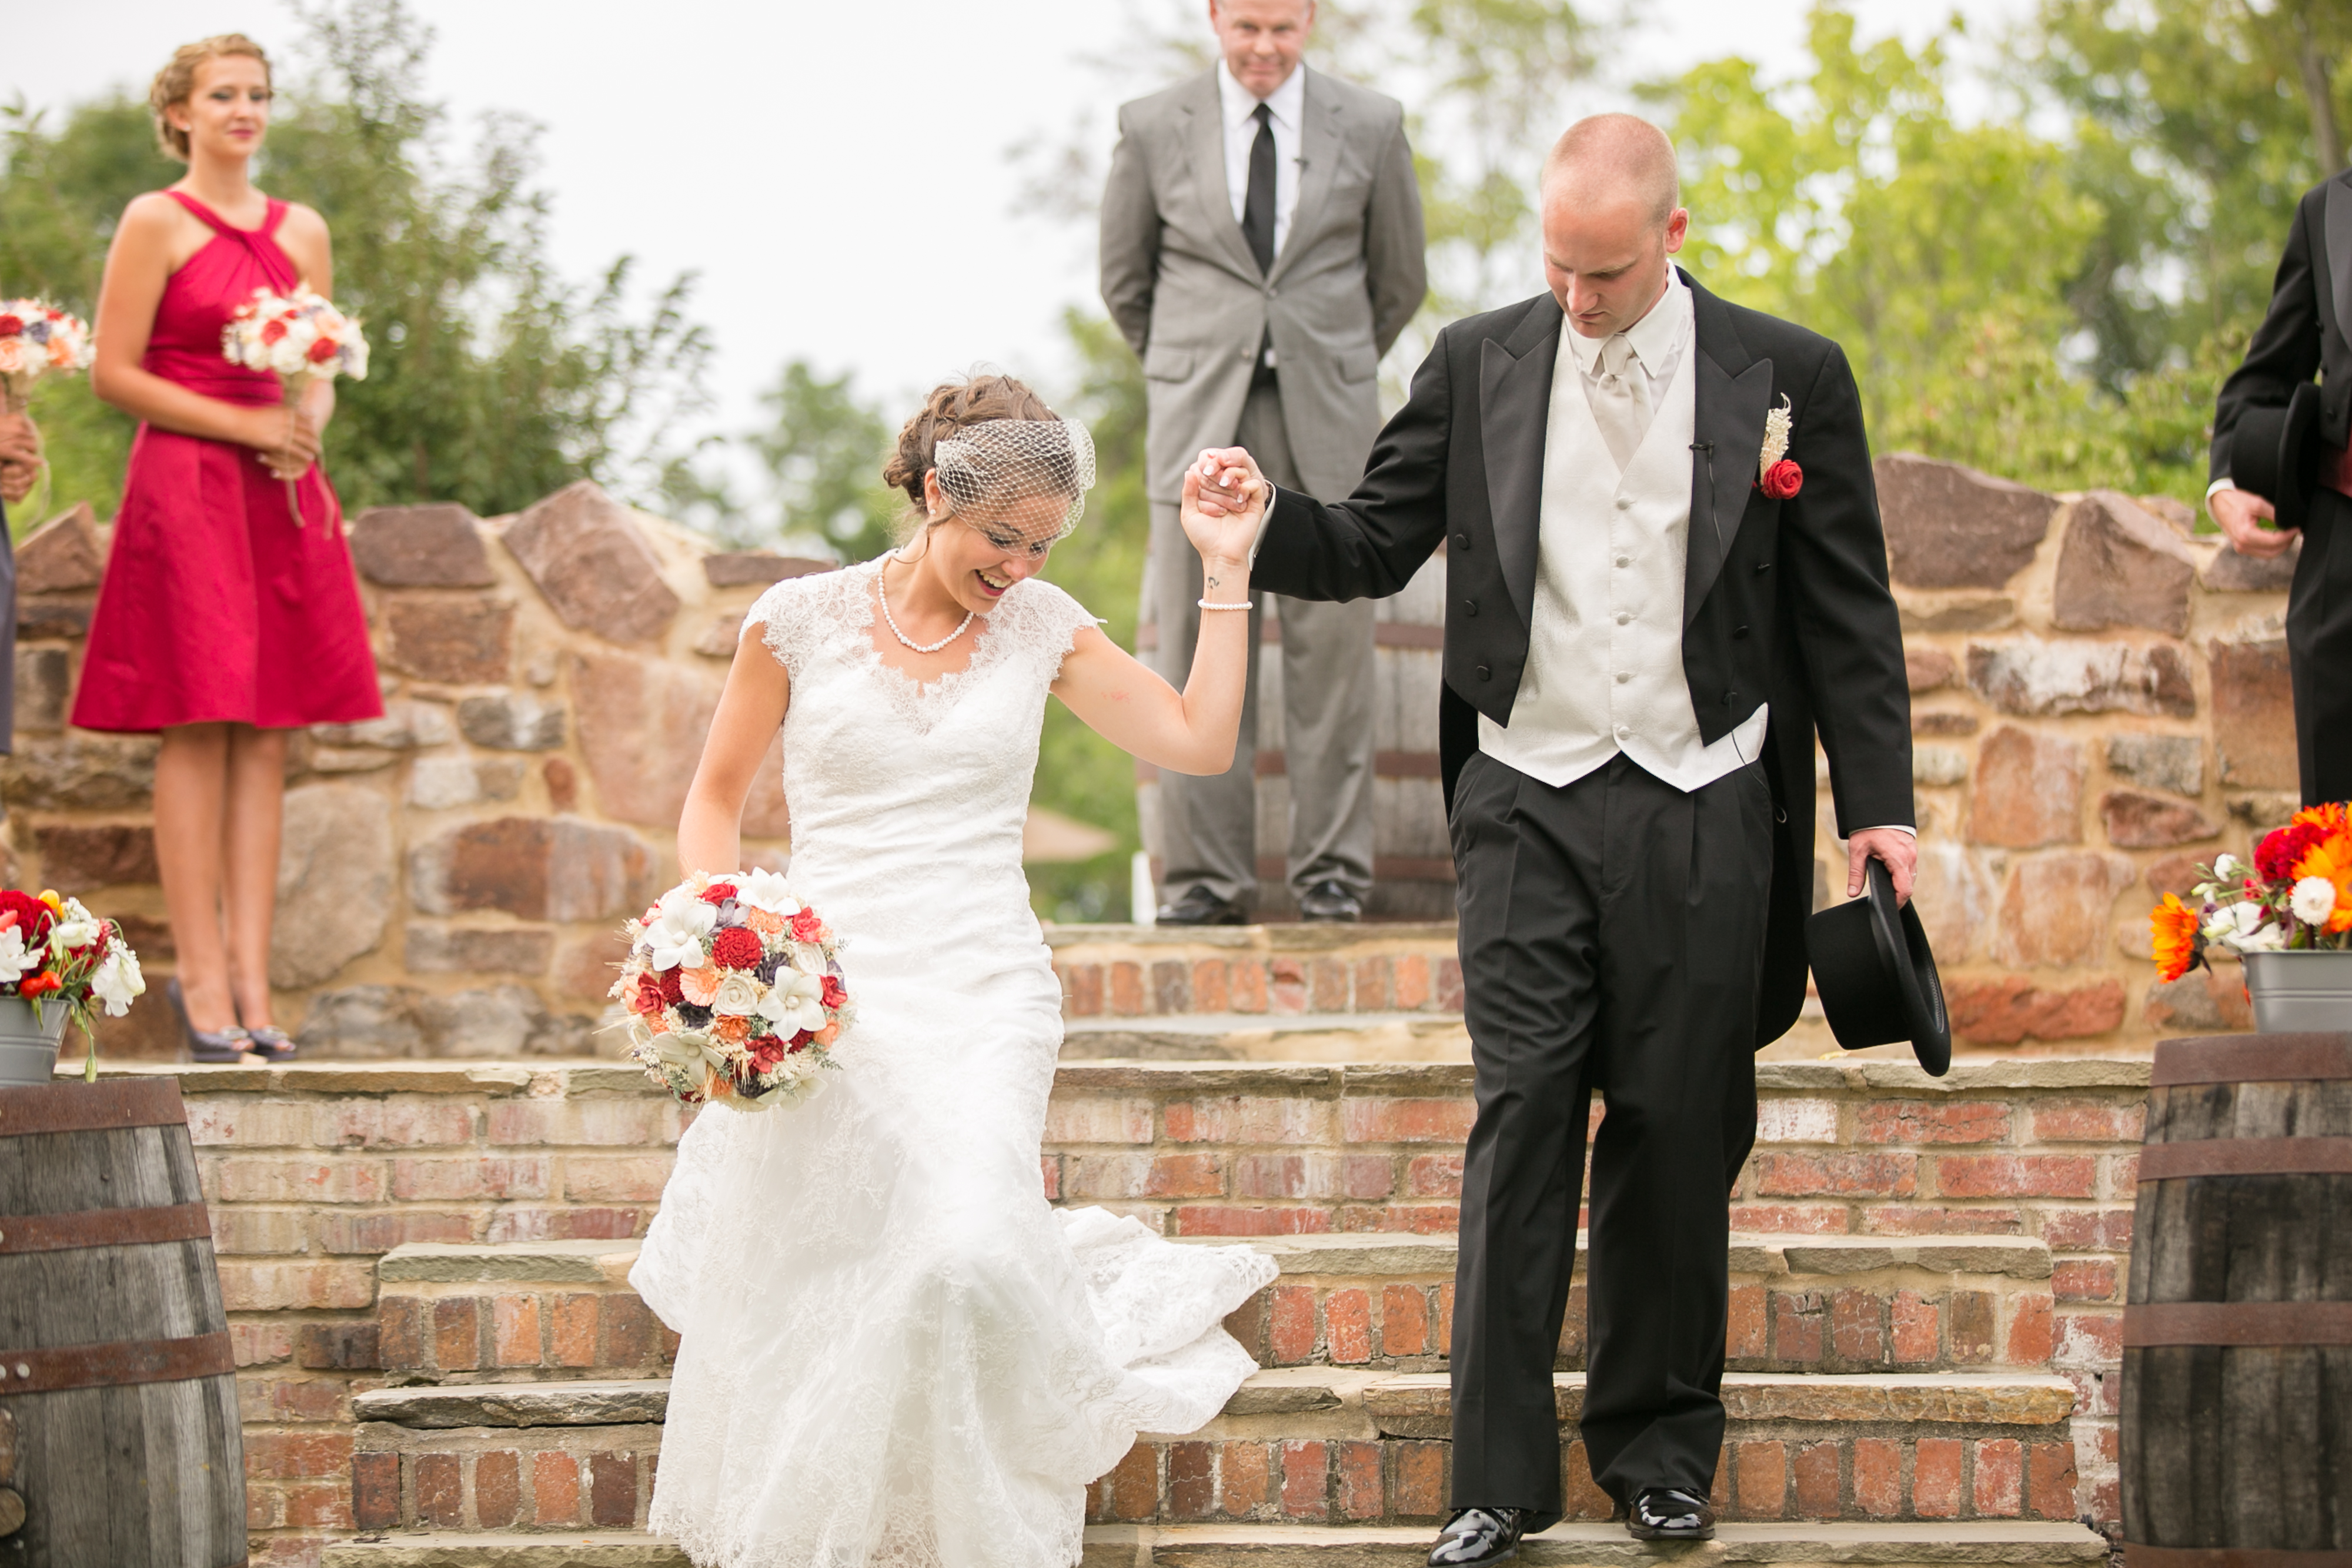 Wedding Reception Venues In Waldorf Md : Cournti matt winery at bull run wedding